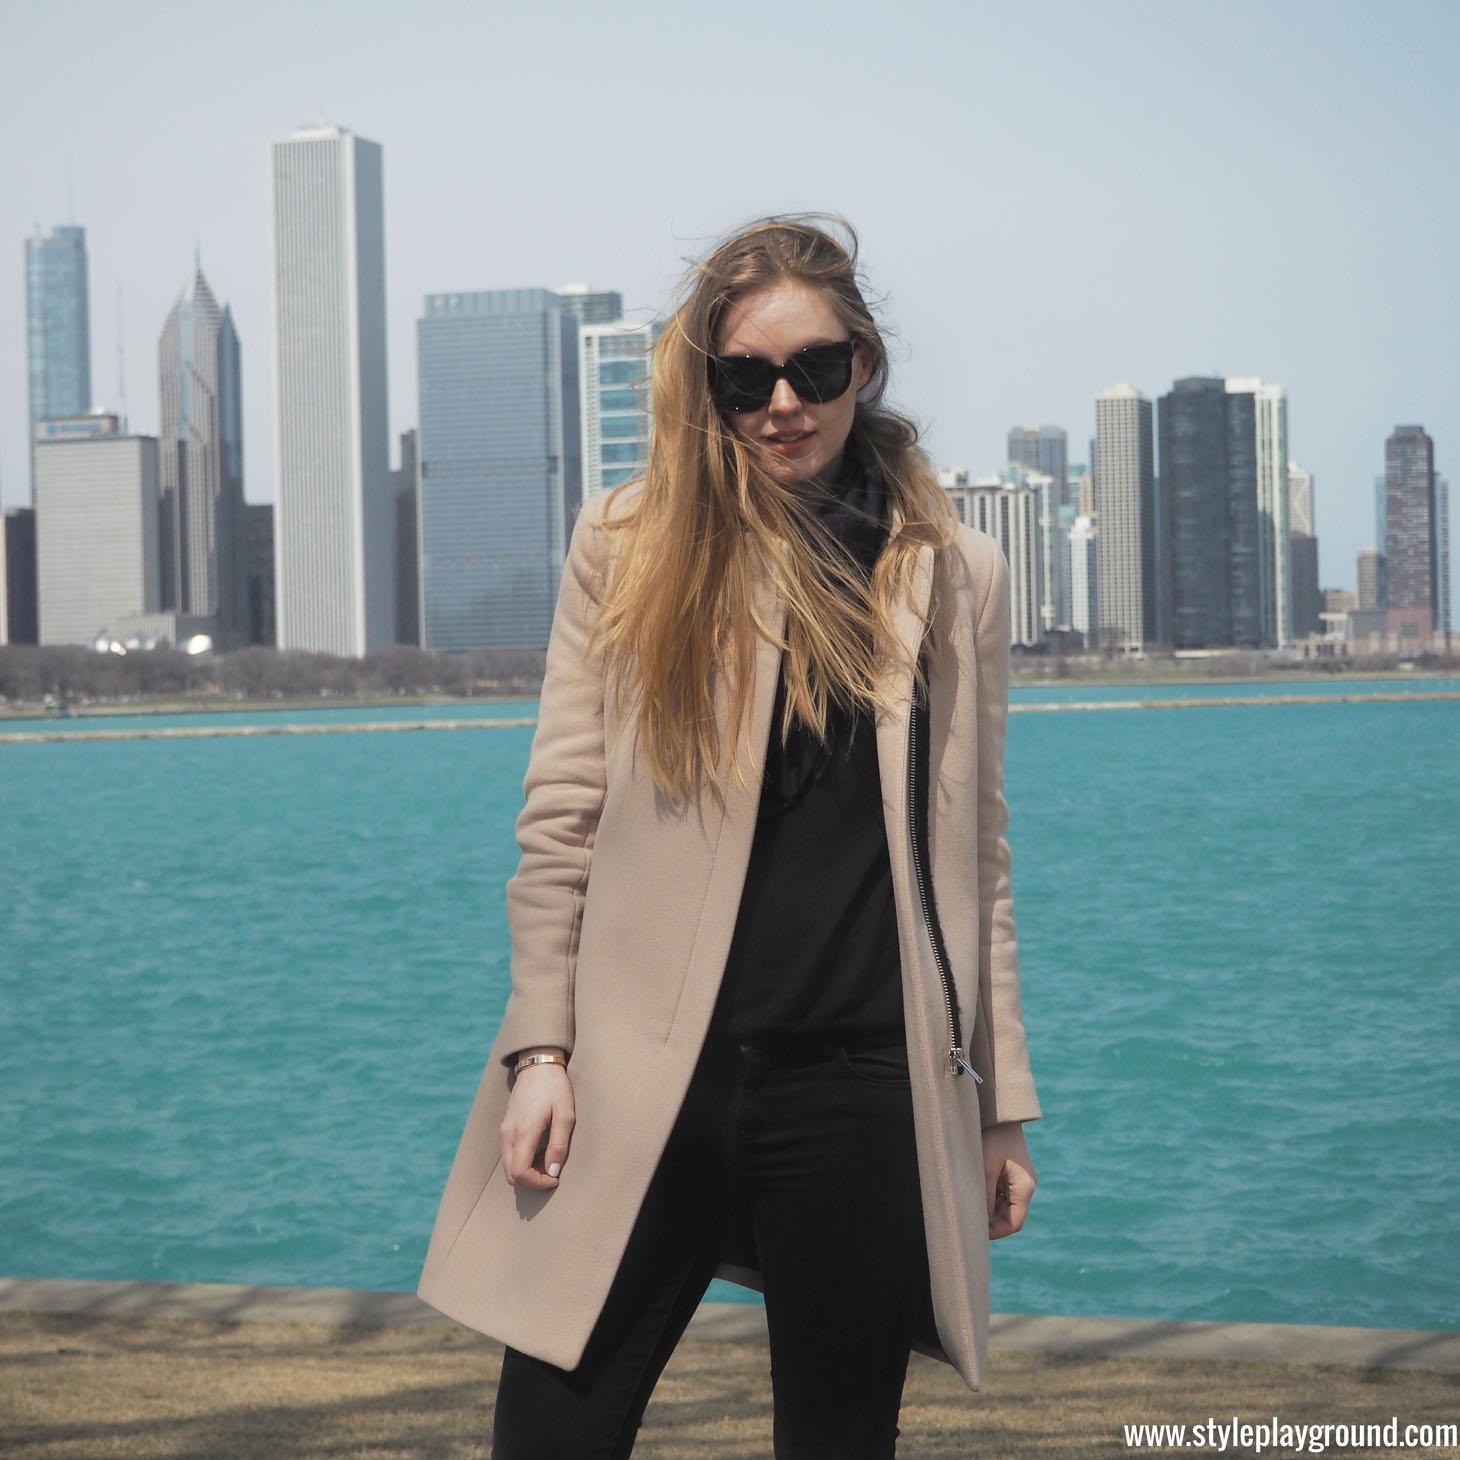 Chicago photo diary